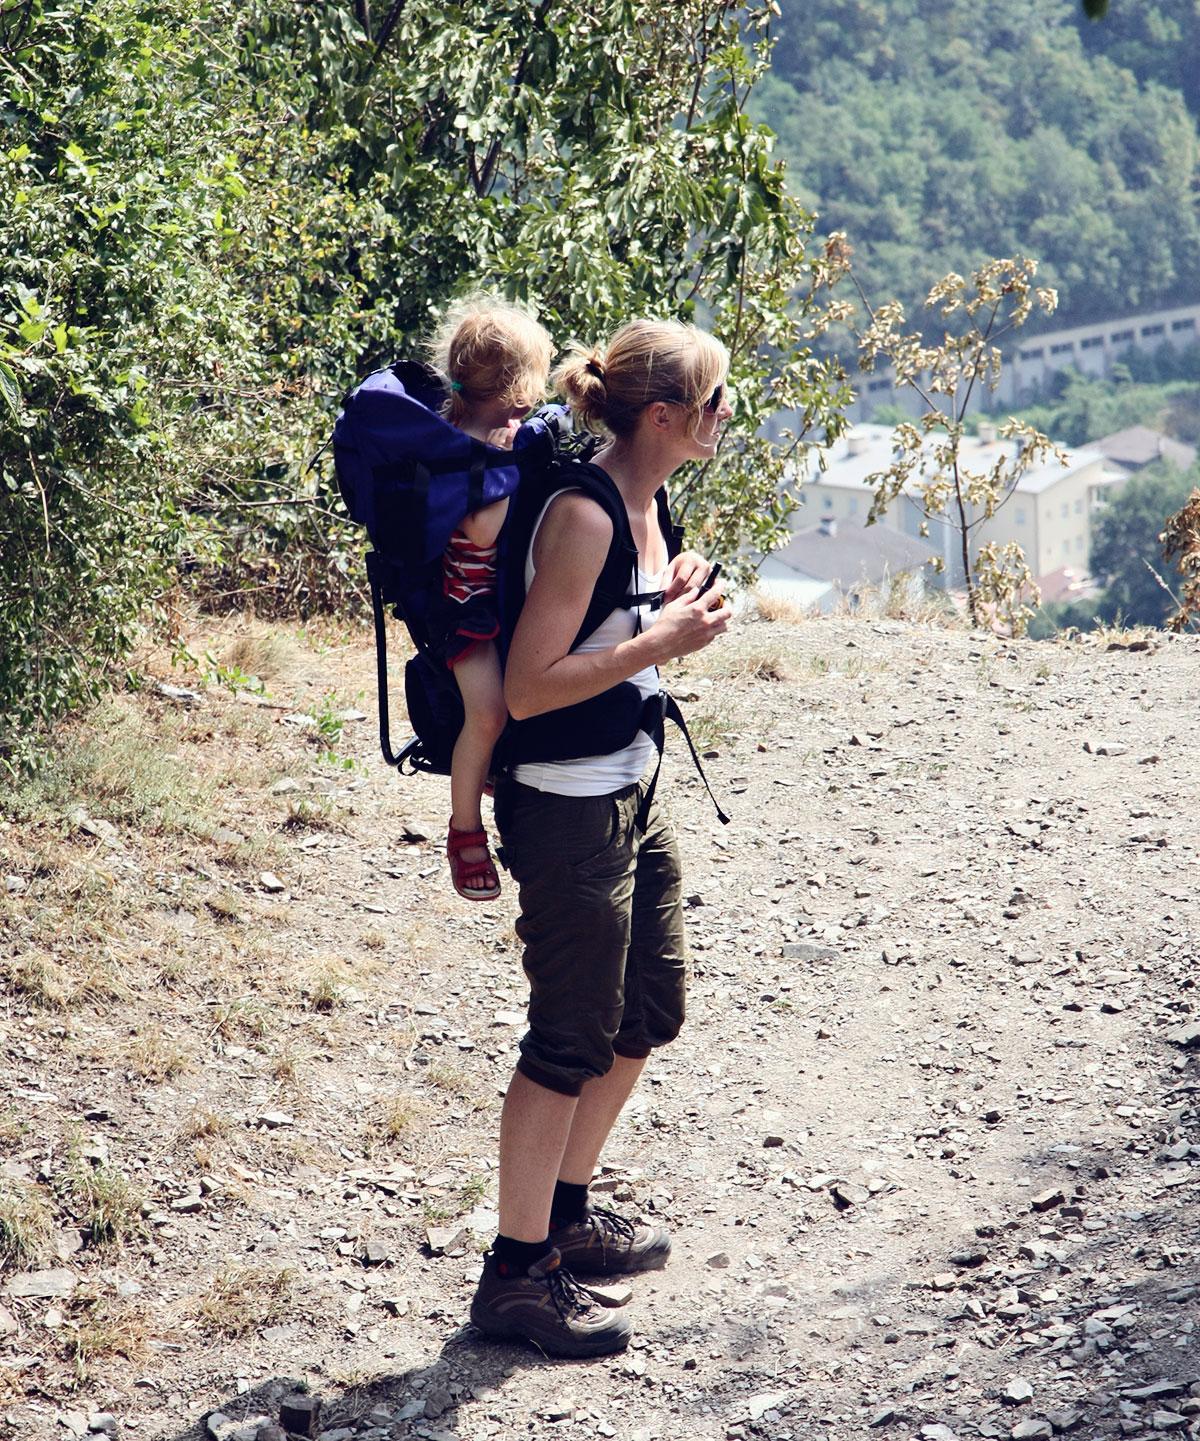 familienurlaub suedtirol wandern mit kindern